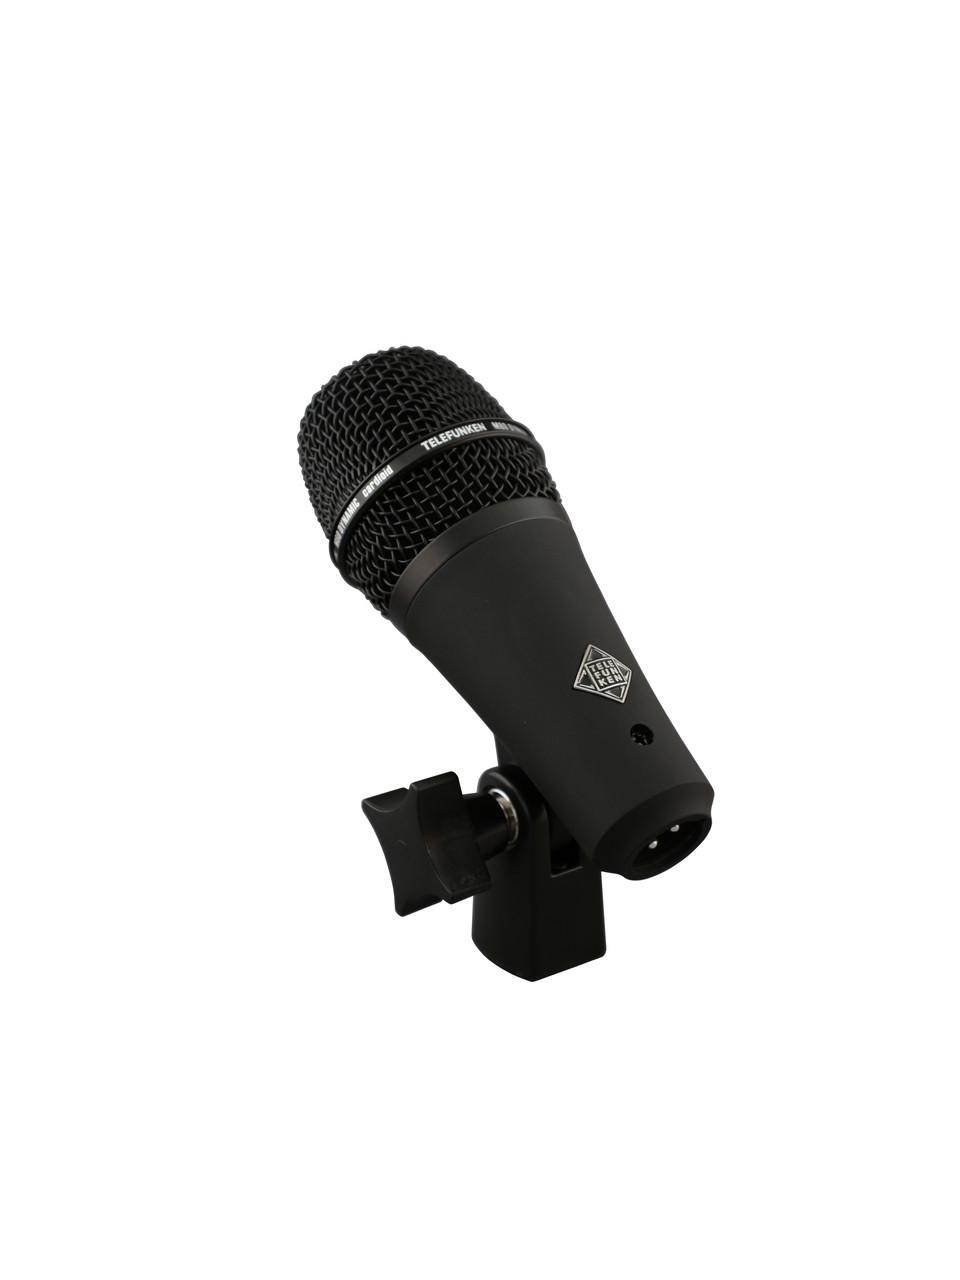 Telefunken M80-SH Dynamic Drum & Instrument Microphone